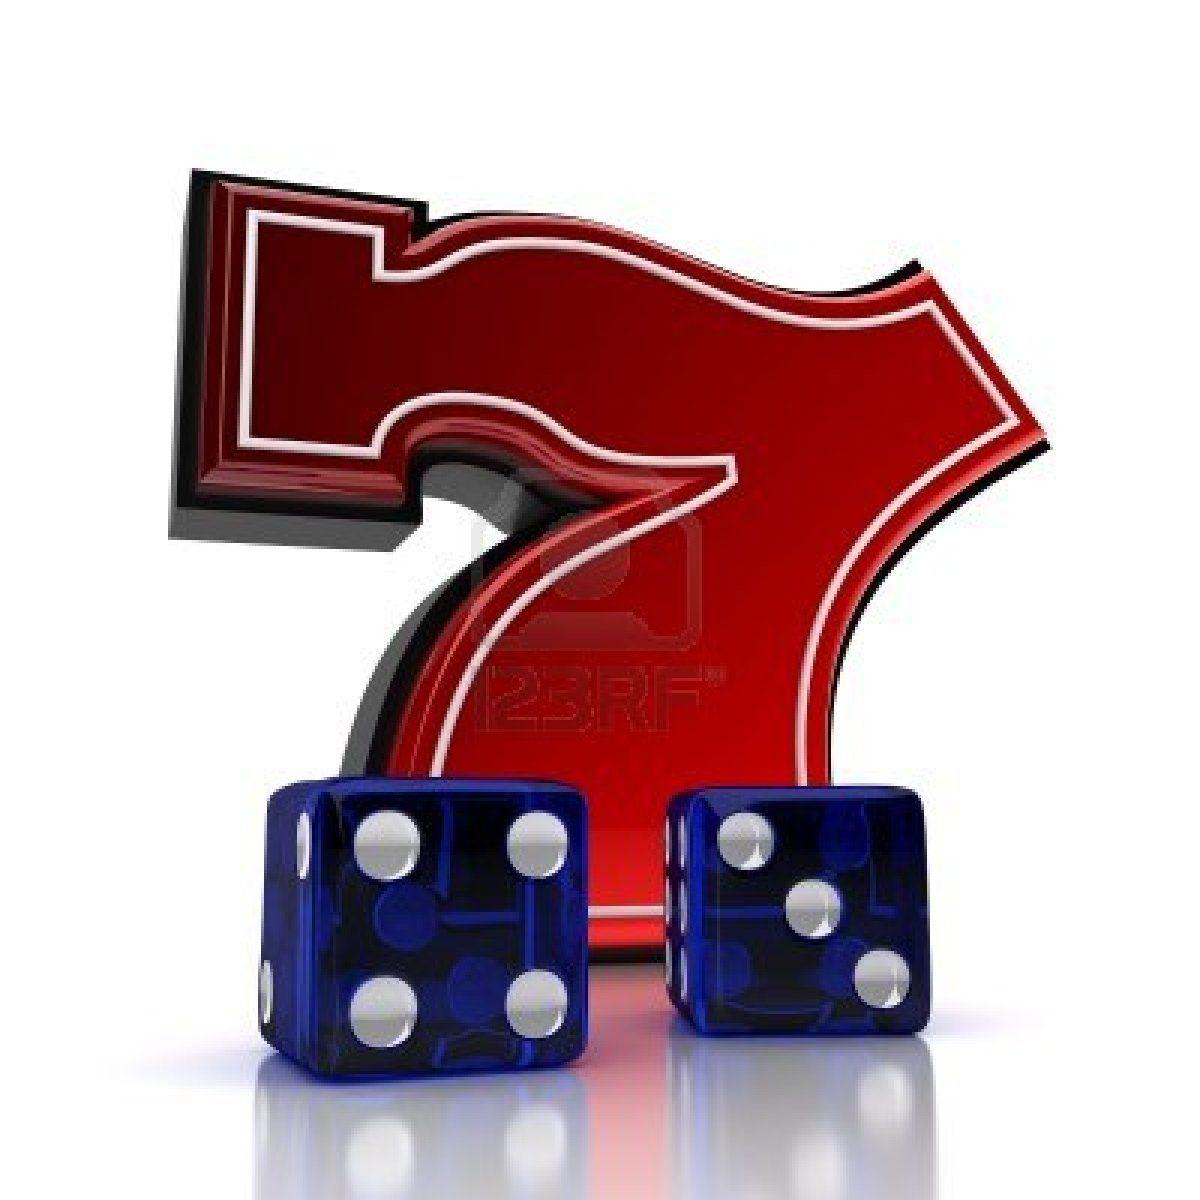 Dice Number 7